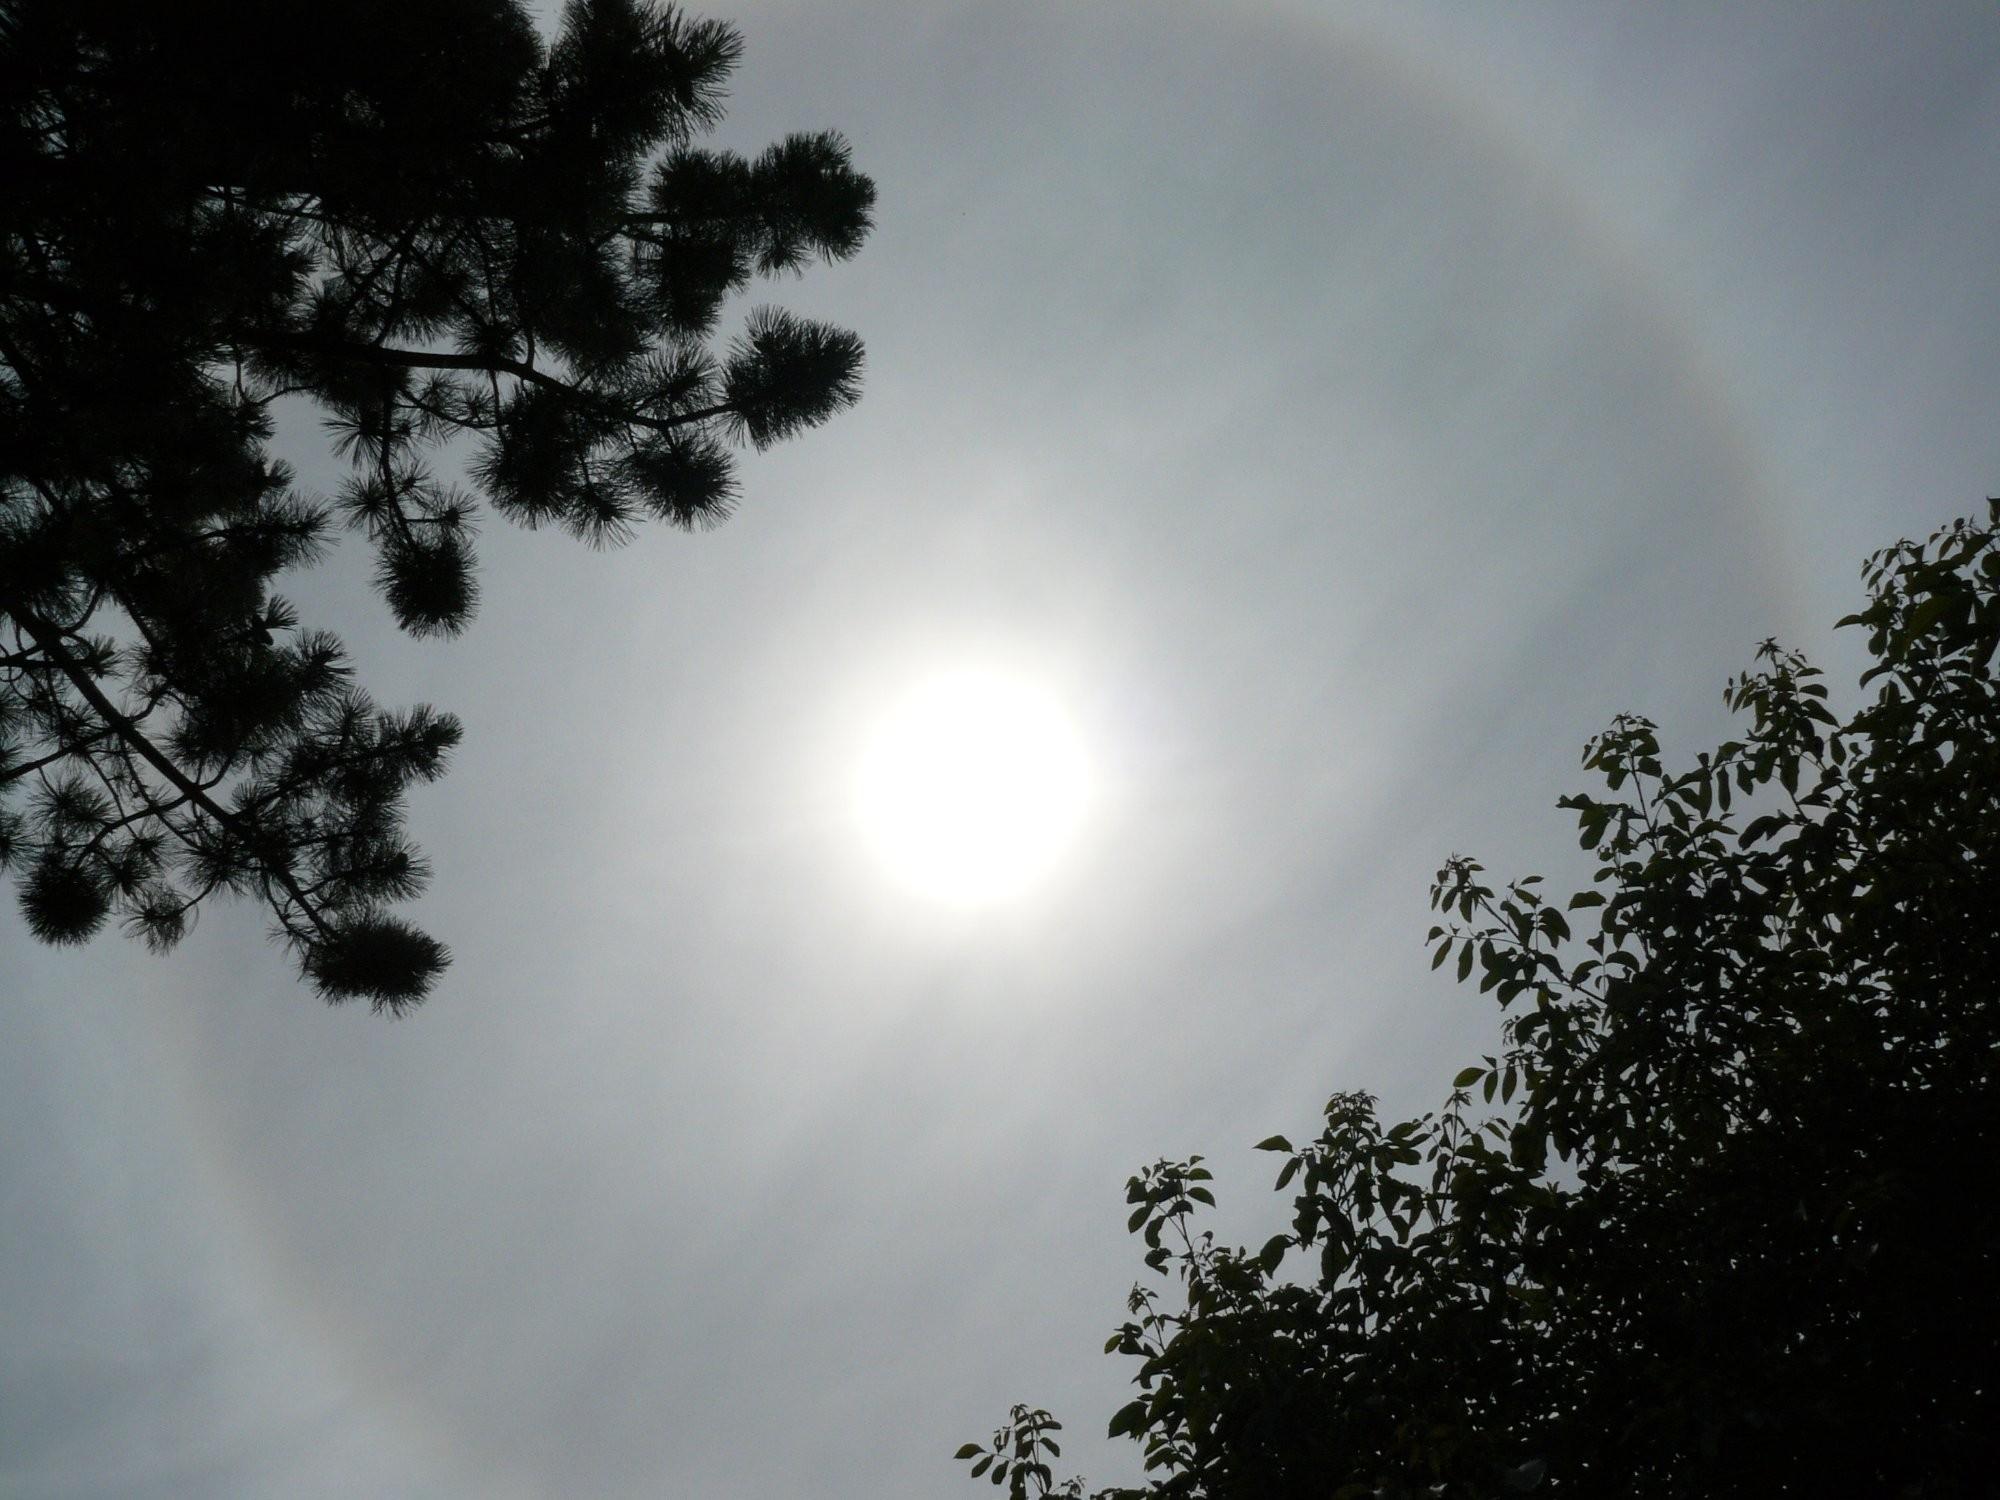 Kruh kolem slunce 23.7.2013 11:06